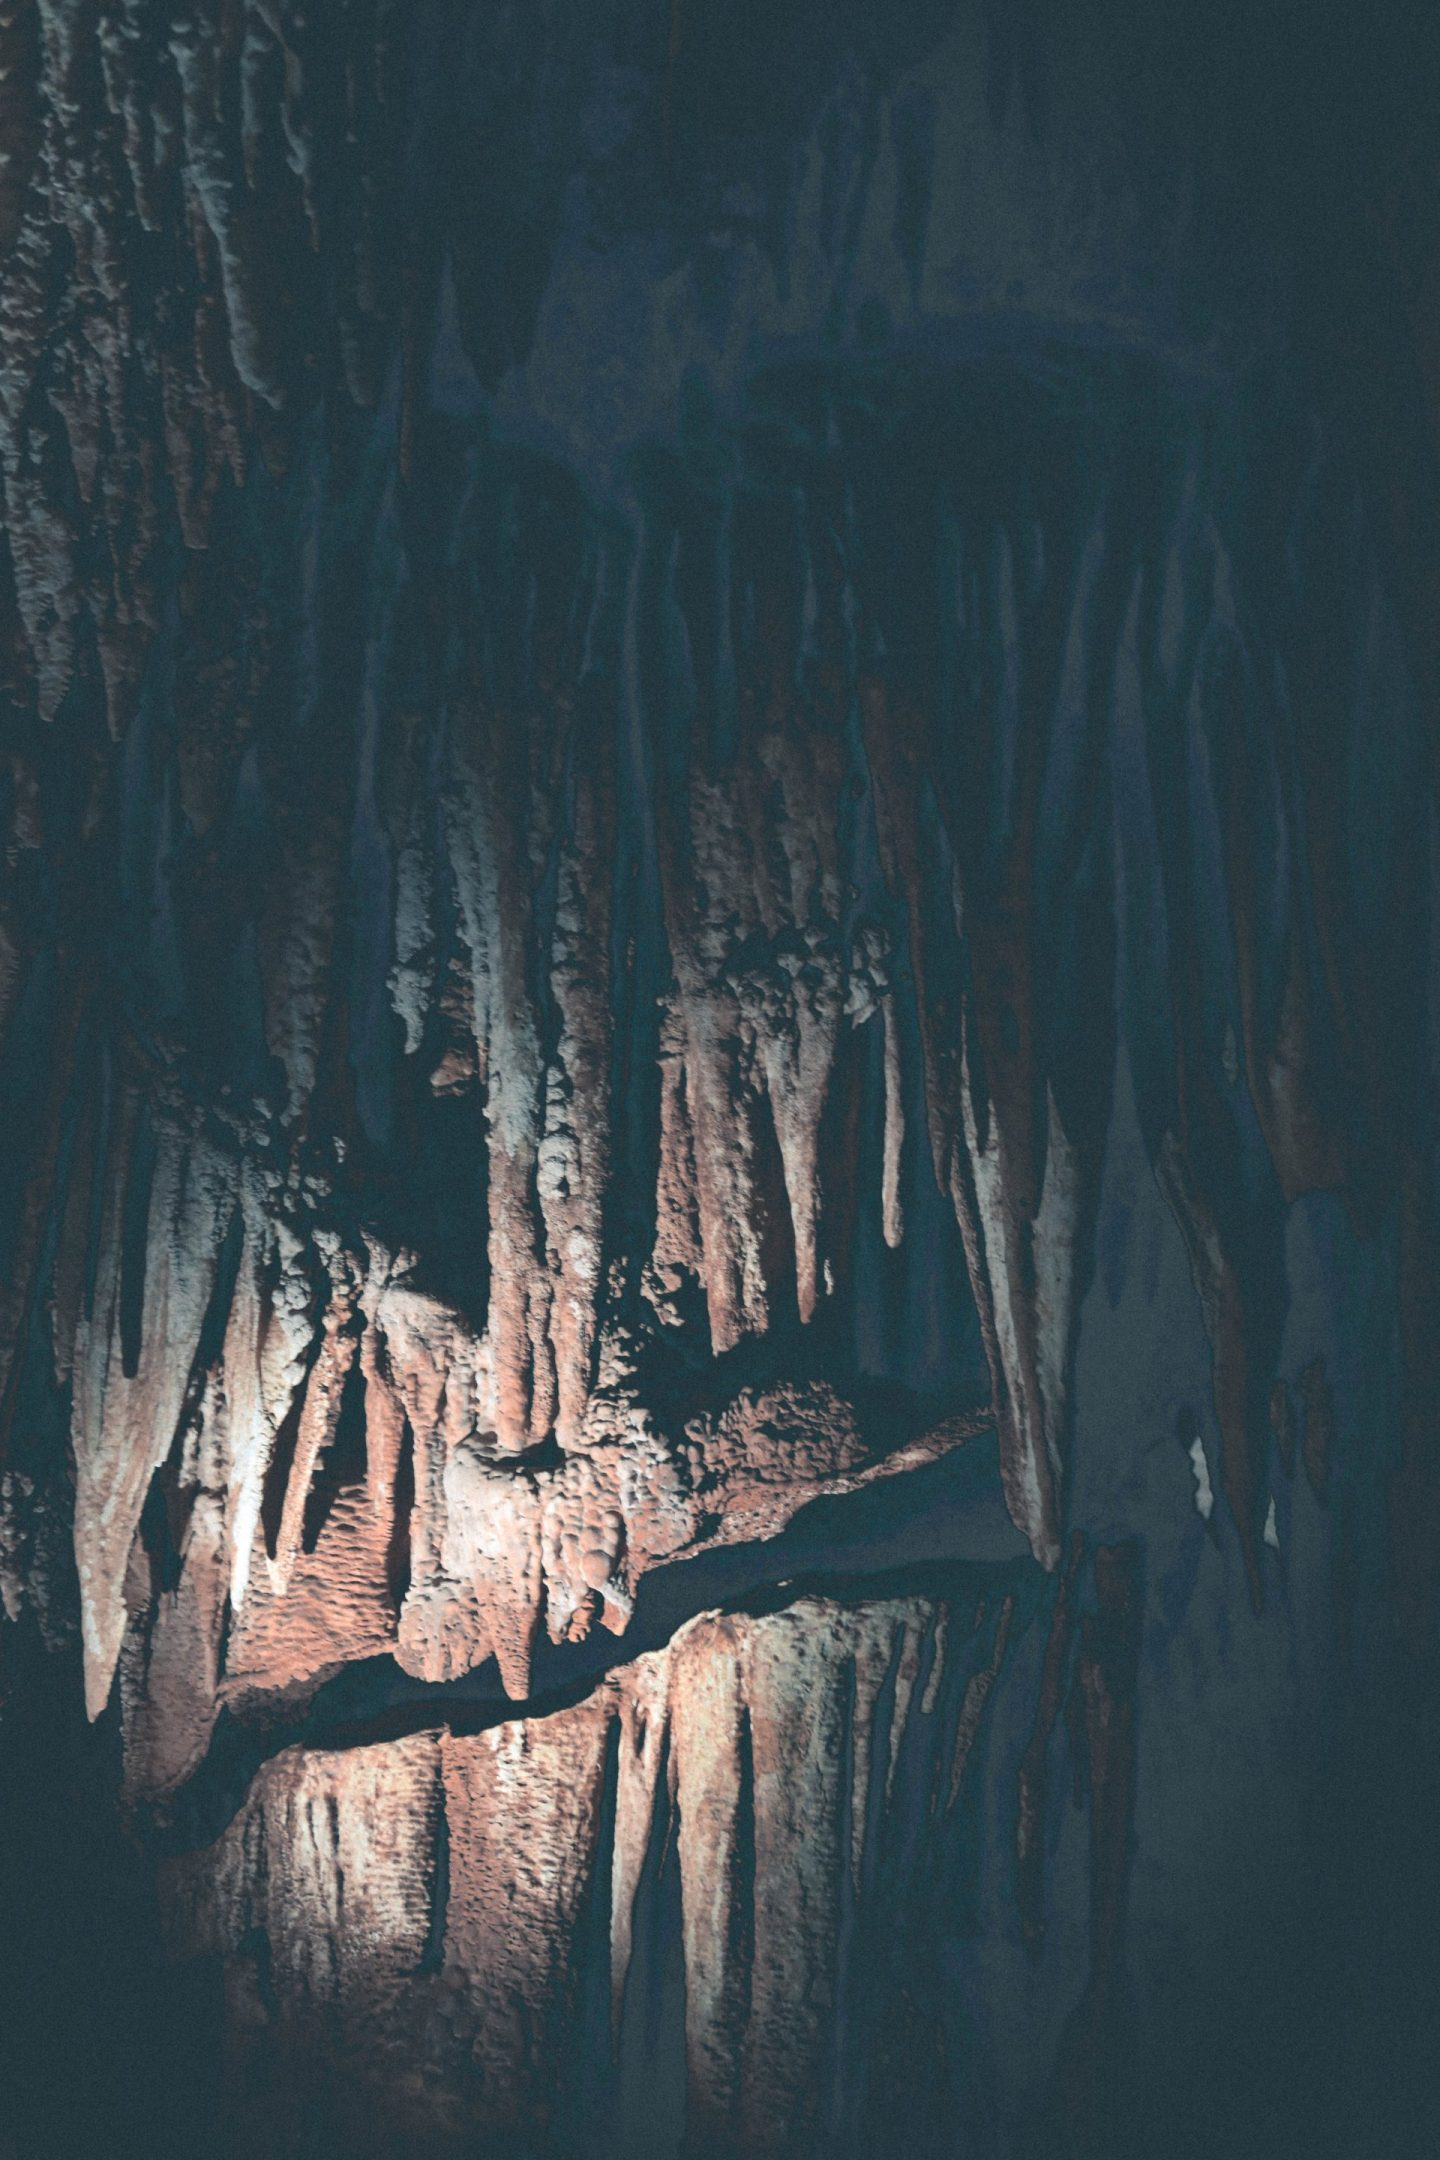 Cayman Islands Crystal Caves